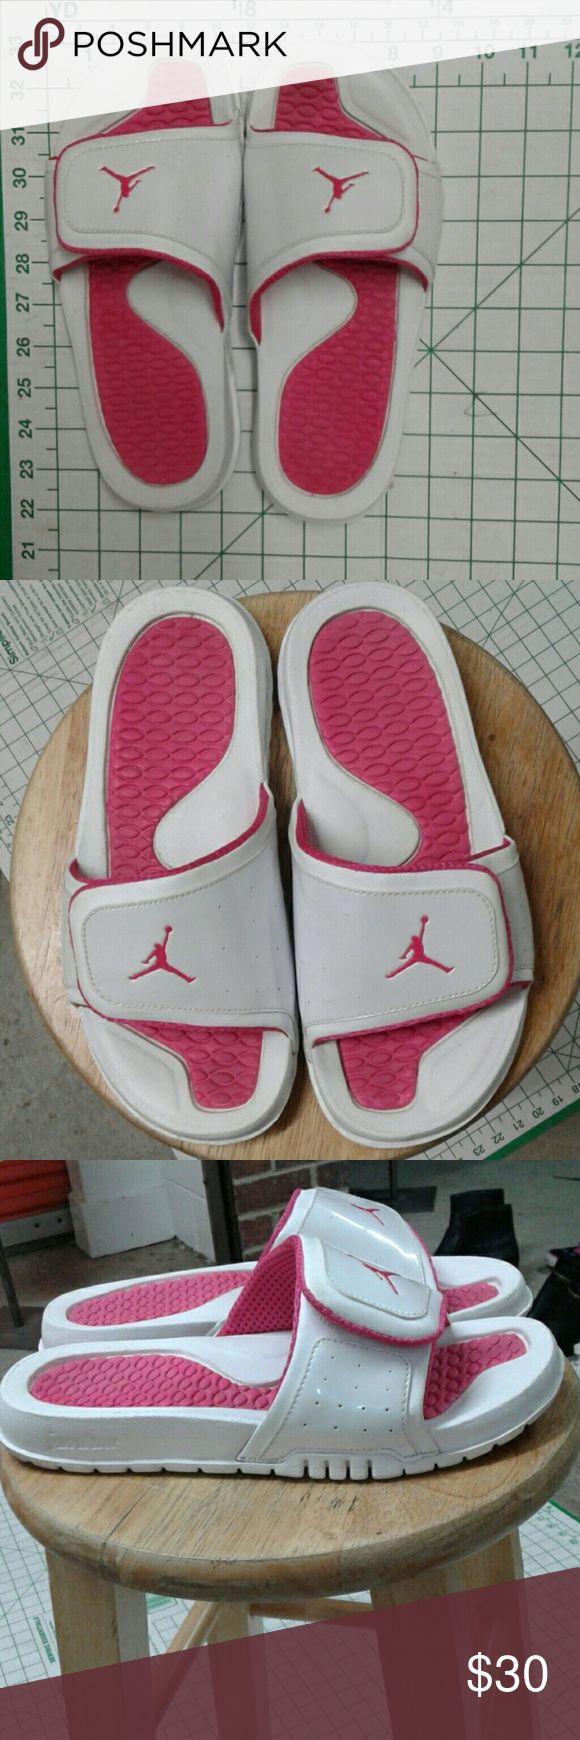 JORDAN flip flops Michael Jordan summertime girls flip flops like new very little wear. Nike Shoes Sandals & Flip Flops